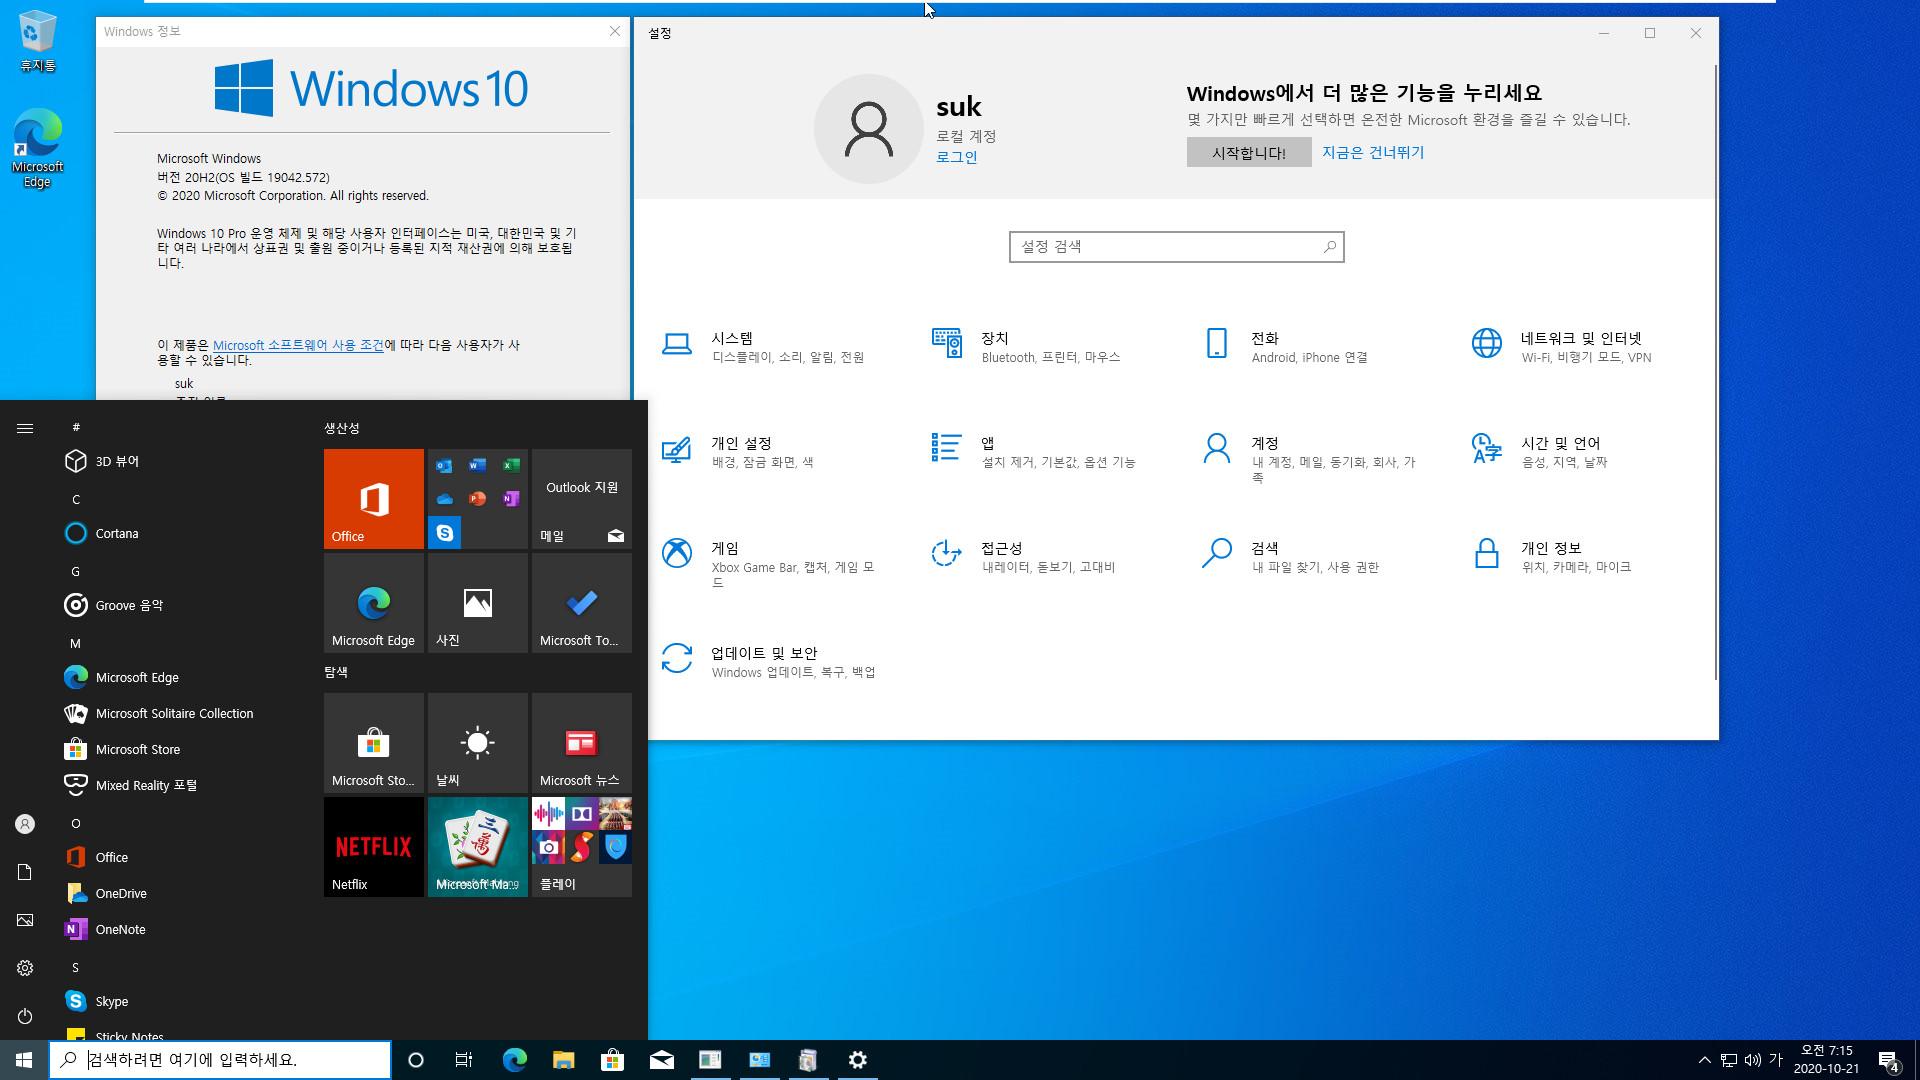 Windows 10 버전 2009 (20H2) 정식 출시되었네요 - MSDN은 19042.508 빌드 9월 정기 업데이트인데, ms 홈페이지는 19042.572 빌드 10월 정기 업데이트네요 - 다운로드하고 윈도우 설치하여 확인해봅니다 2020-10-21_071556.jpg